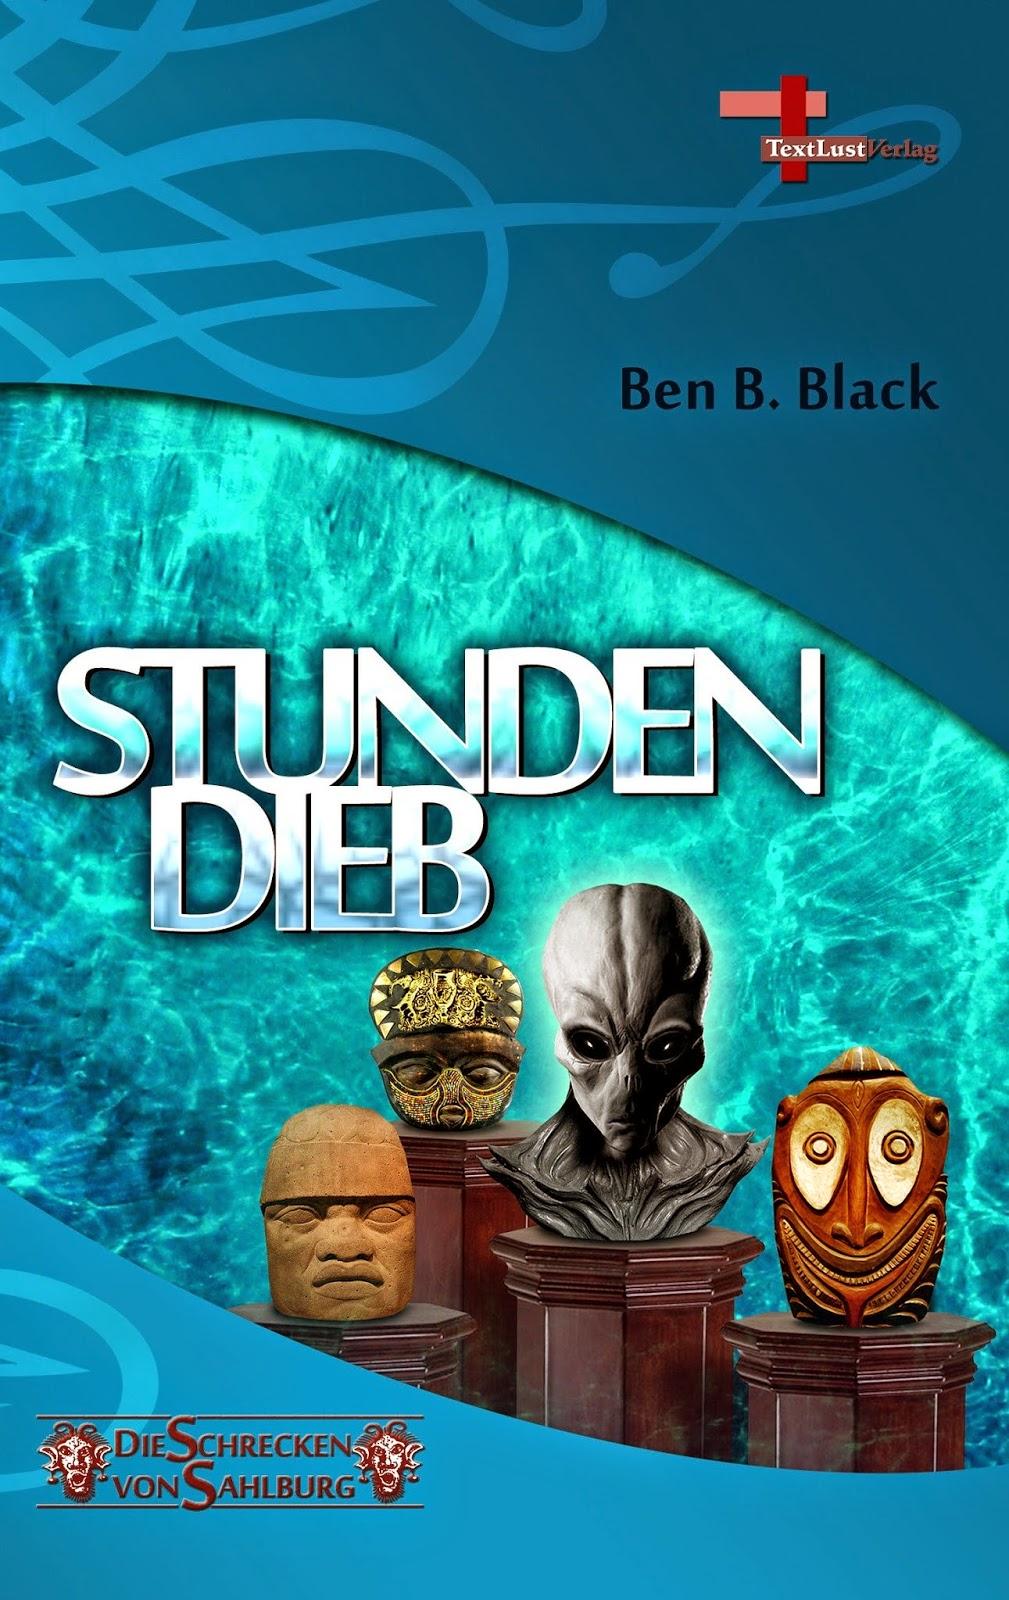 http://www.textlustverlag.de/buecher/serien/book.php?id=svs02